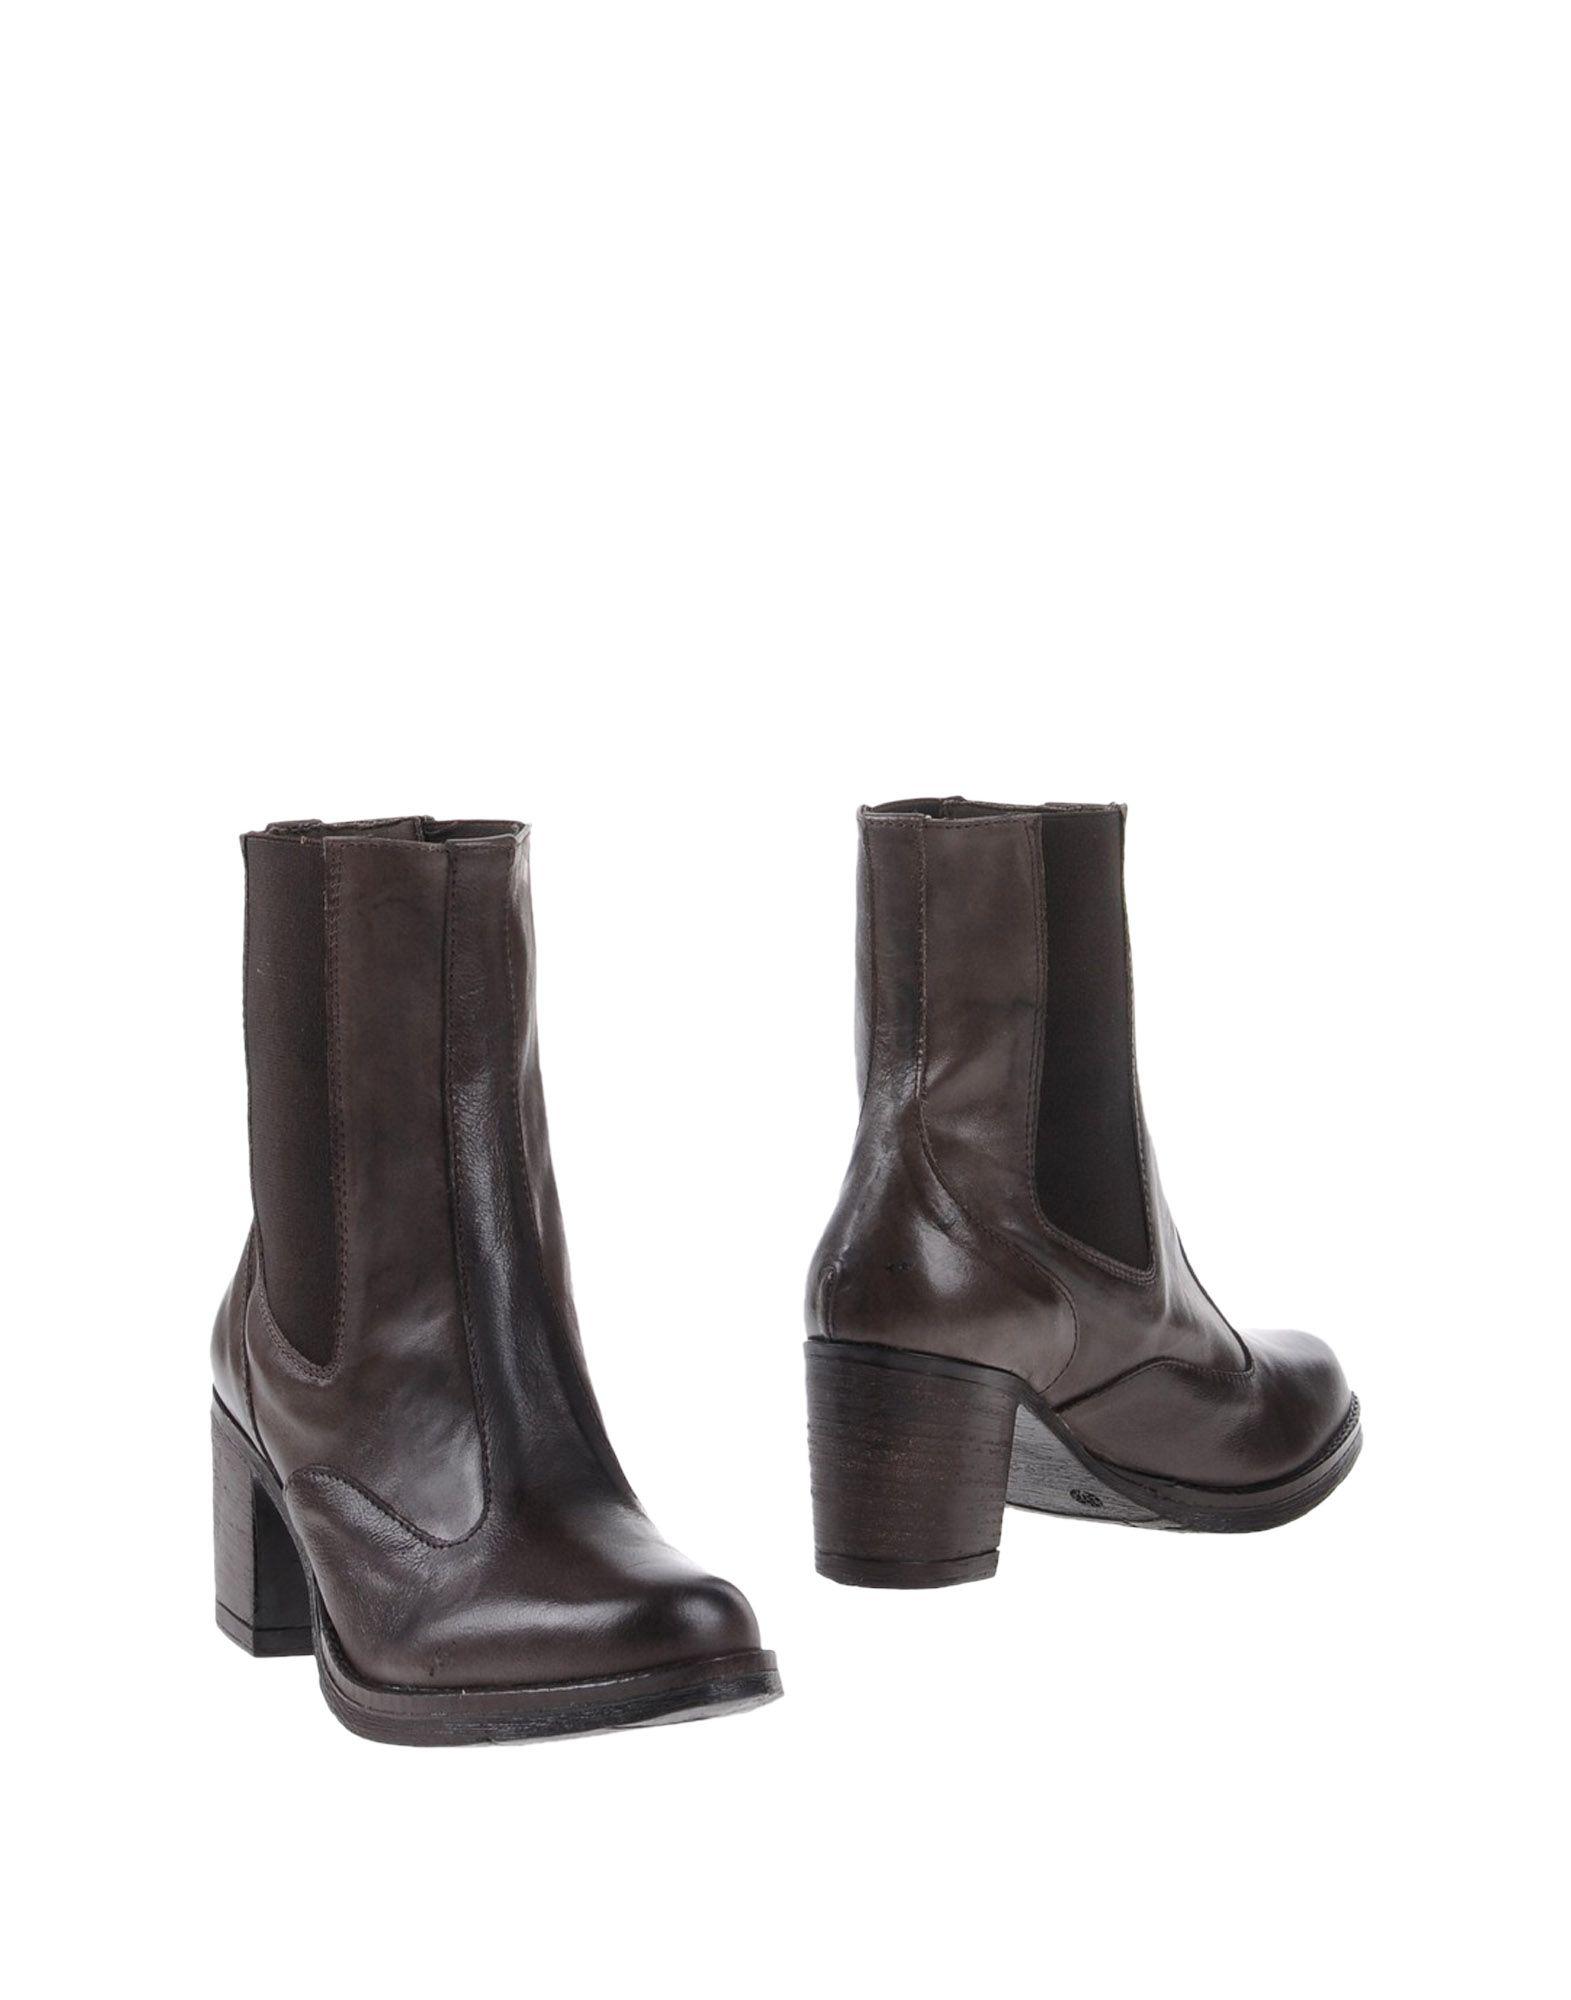 NOCORRECT Полусапоги и высокие ботинки magazzini del sale полусапоги и высокие ботинки